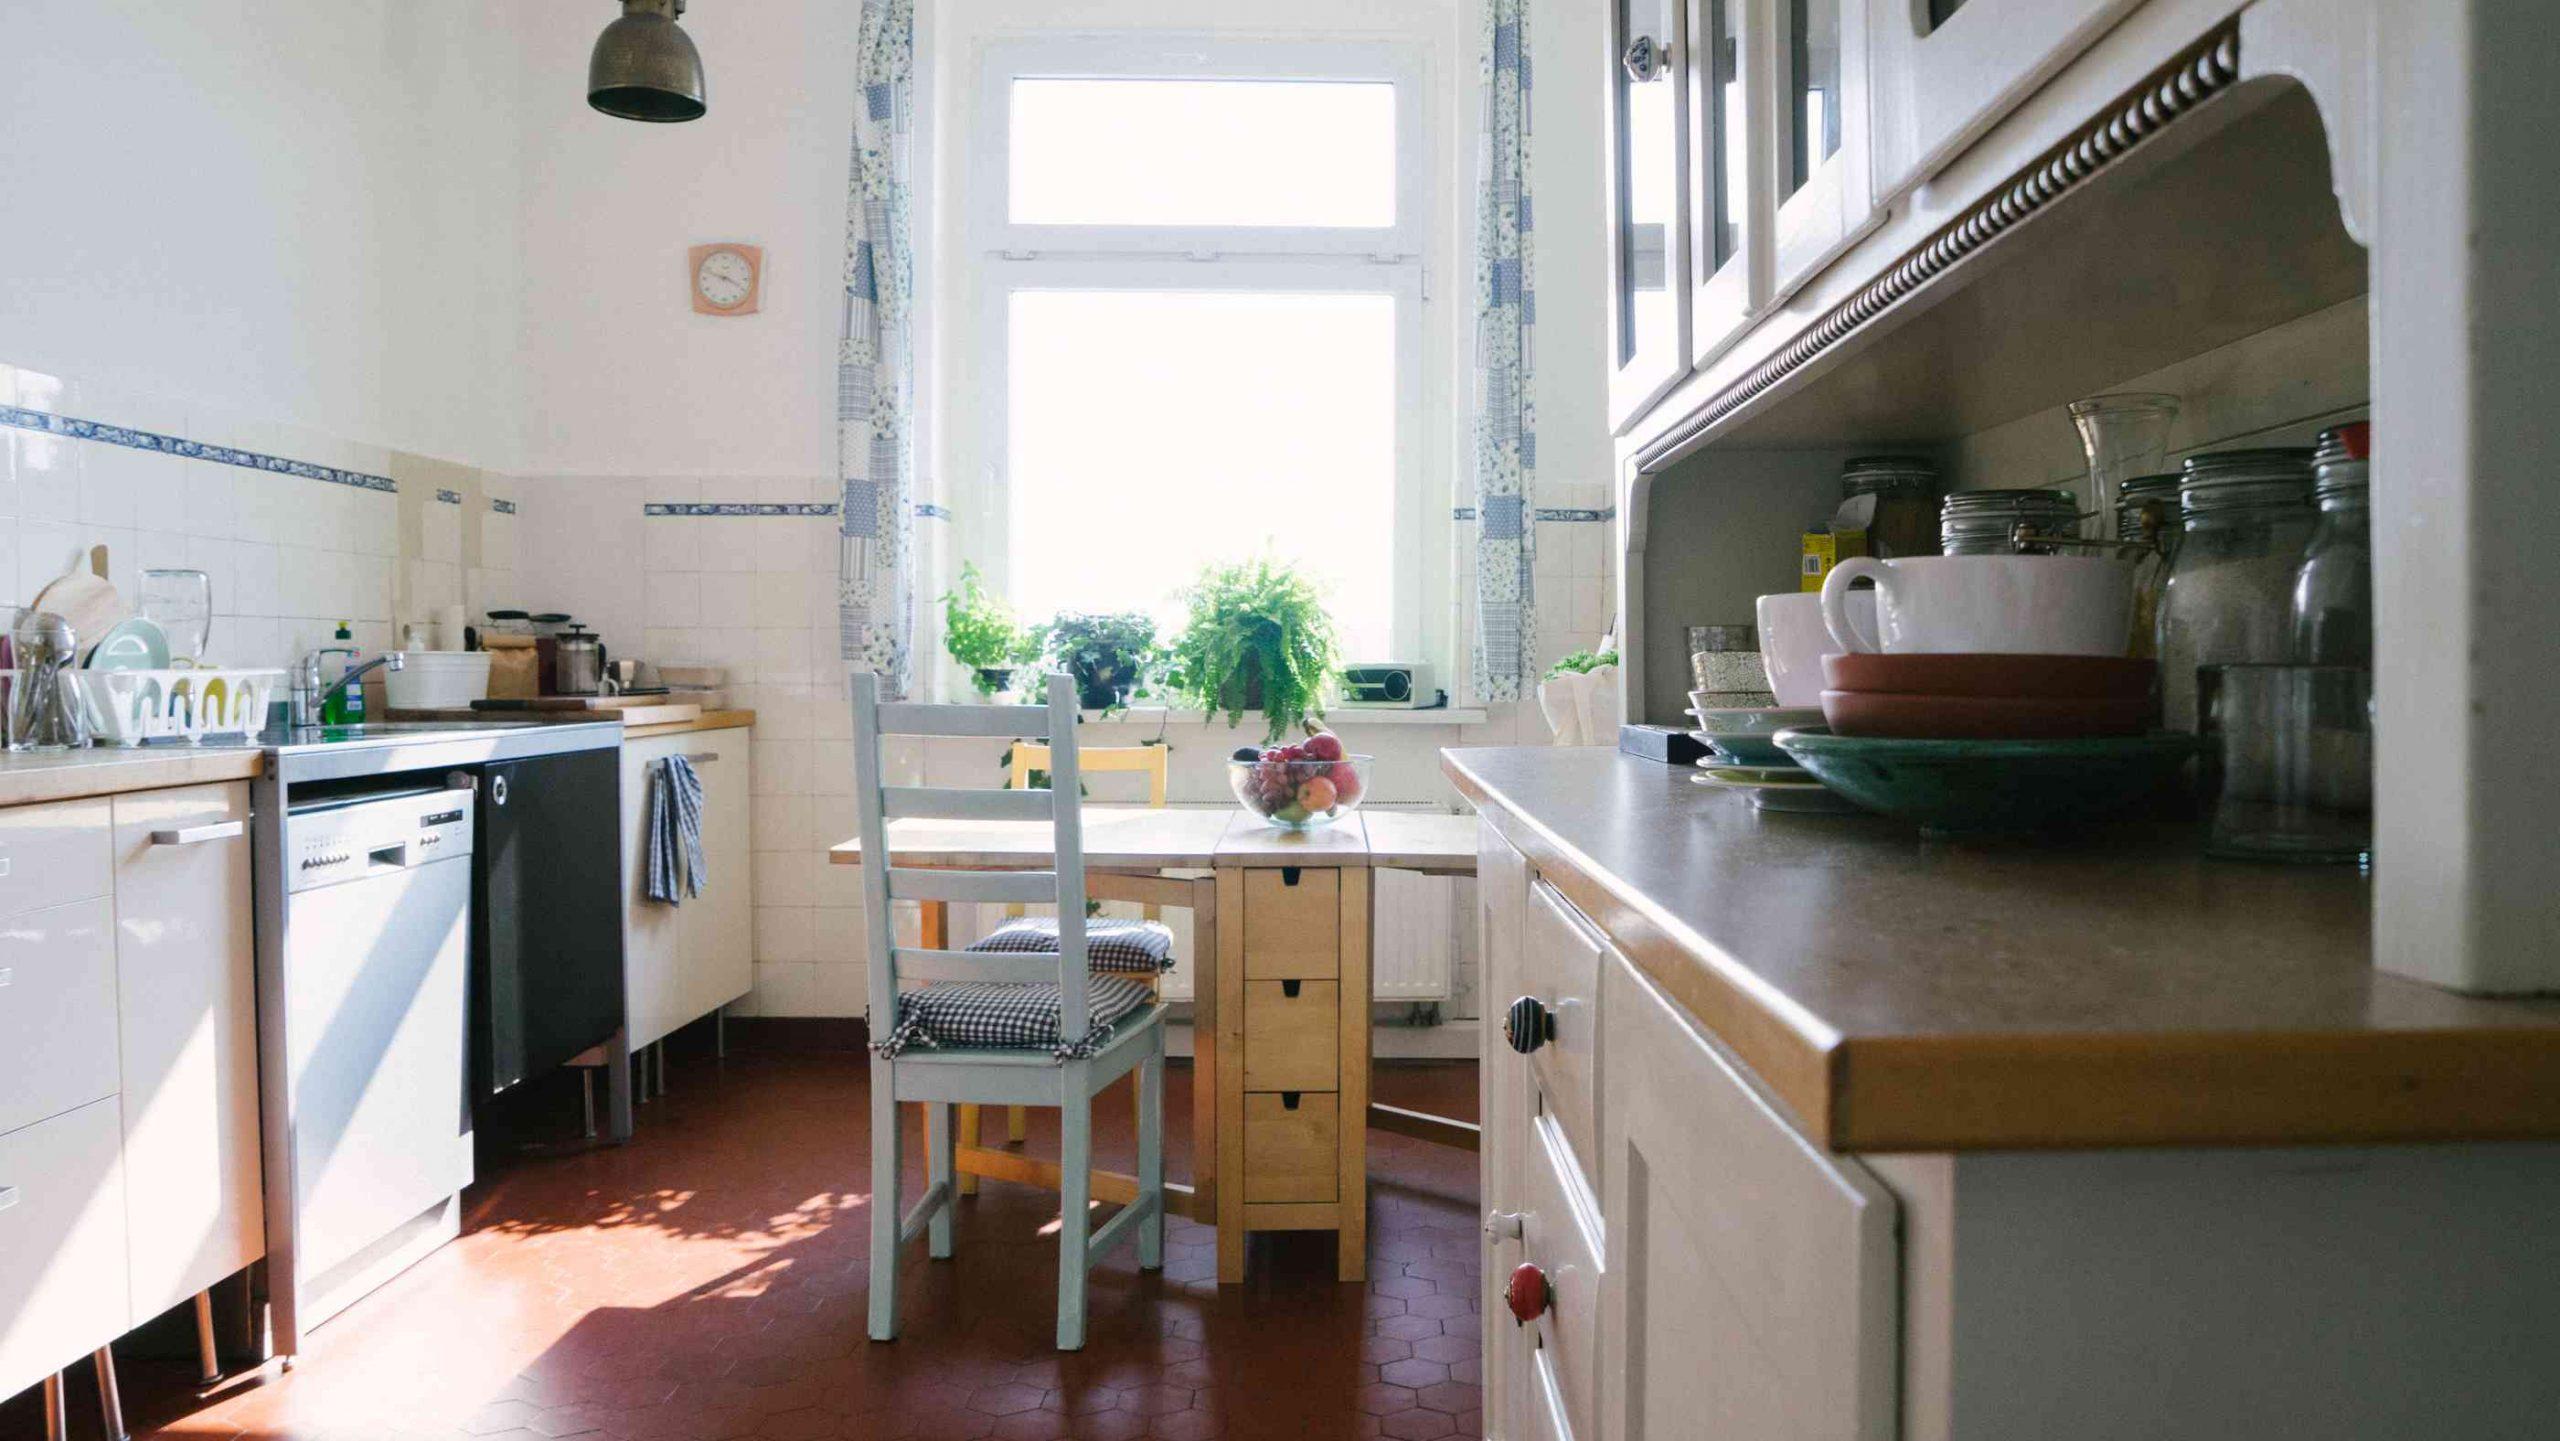 Full Size of Bodenbelag Küche Granit Bodenbelag Küche Kaufen Boden übergang Küche Wohnzimmer Bodenbelag Zu Grauer Küche Küche Bodenbelag Küche